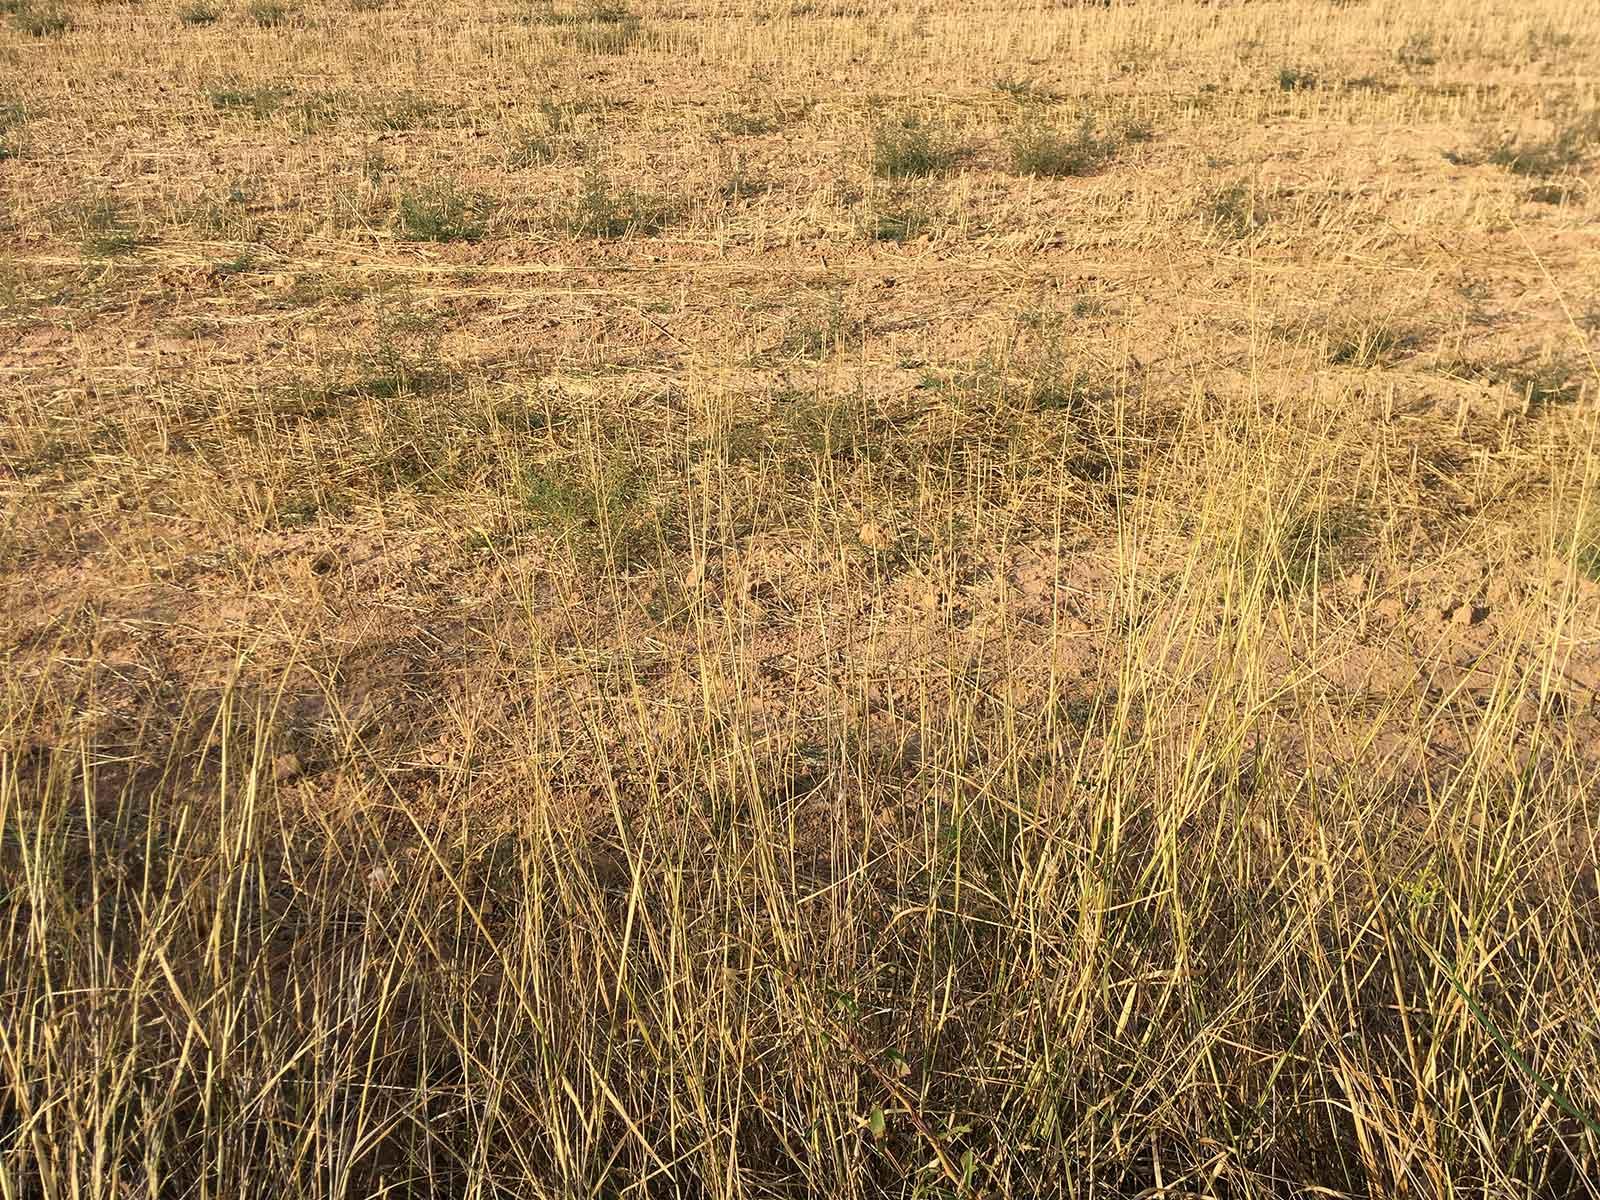 Yecla, campos yermos, julio 2017